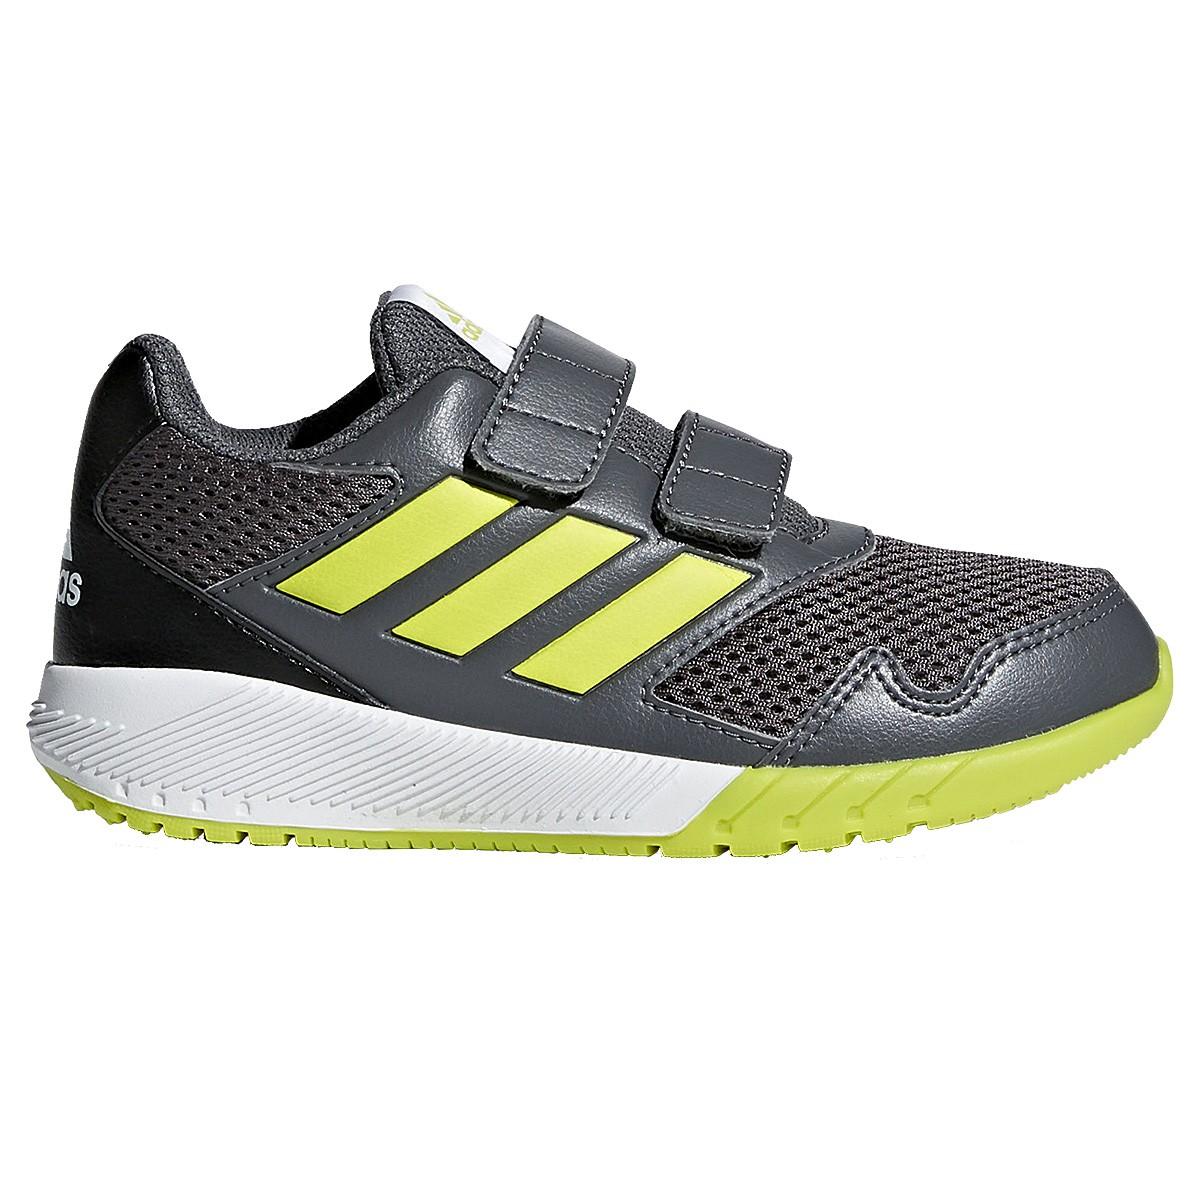 chaussures running adidas altarun gar on chaussures sport. Black Bedroom Furniture Sets. Home Design Ideas